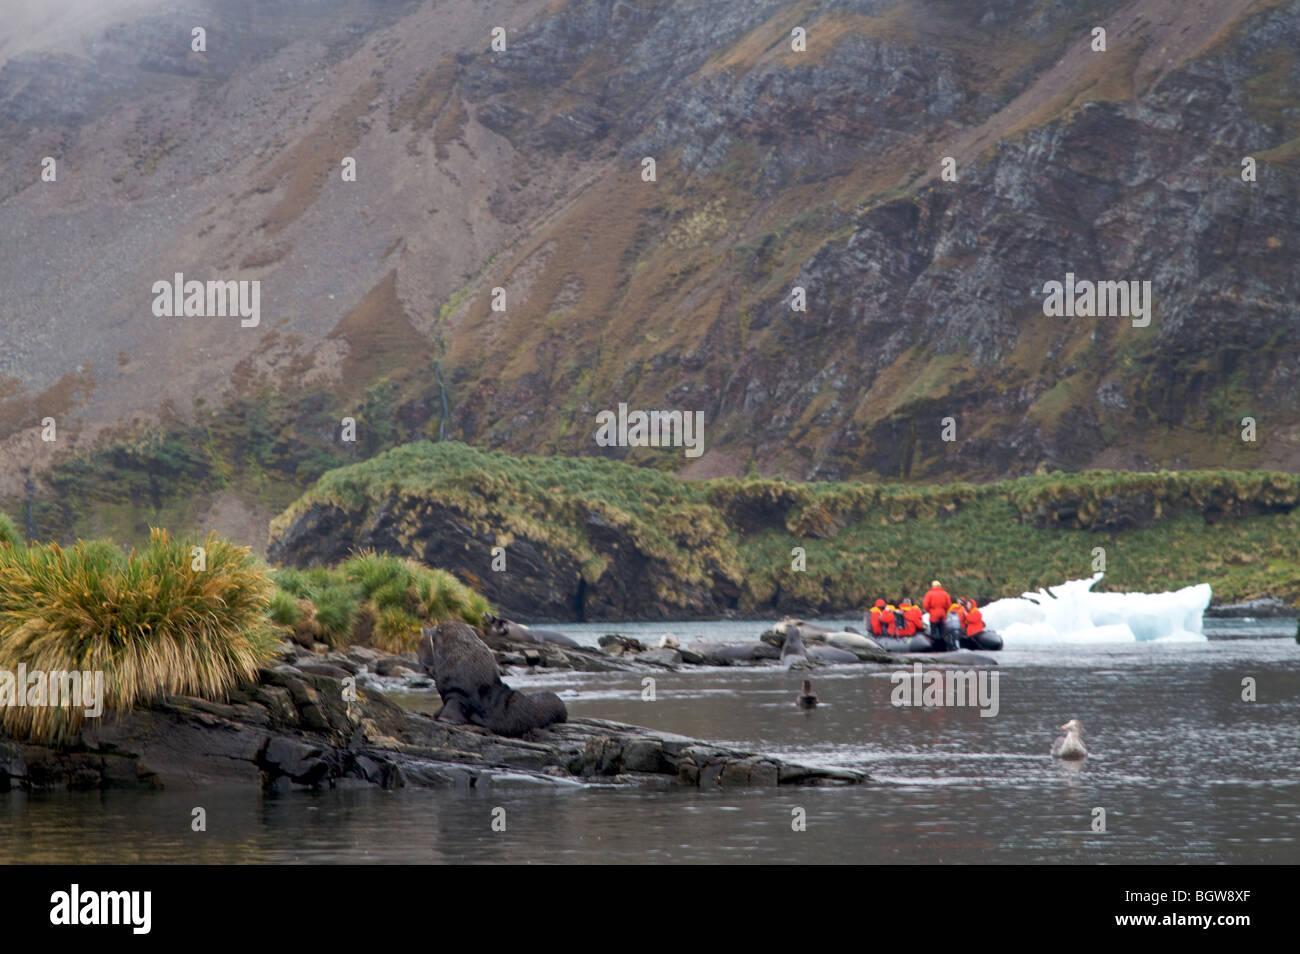 Tourists exploring South Georgia Island by zodiac - Stock Image